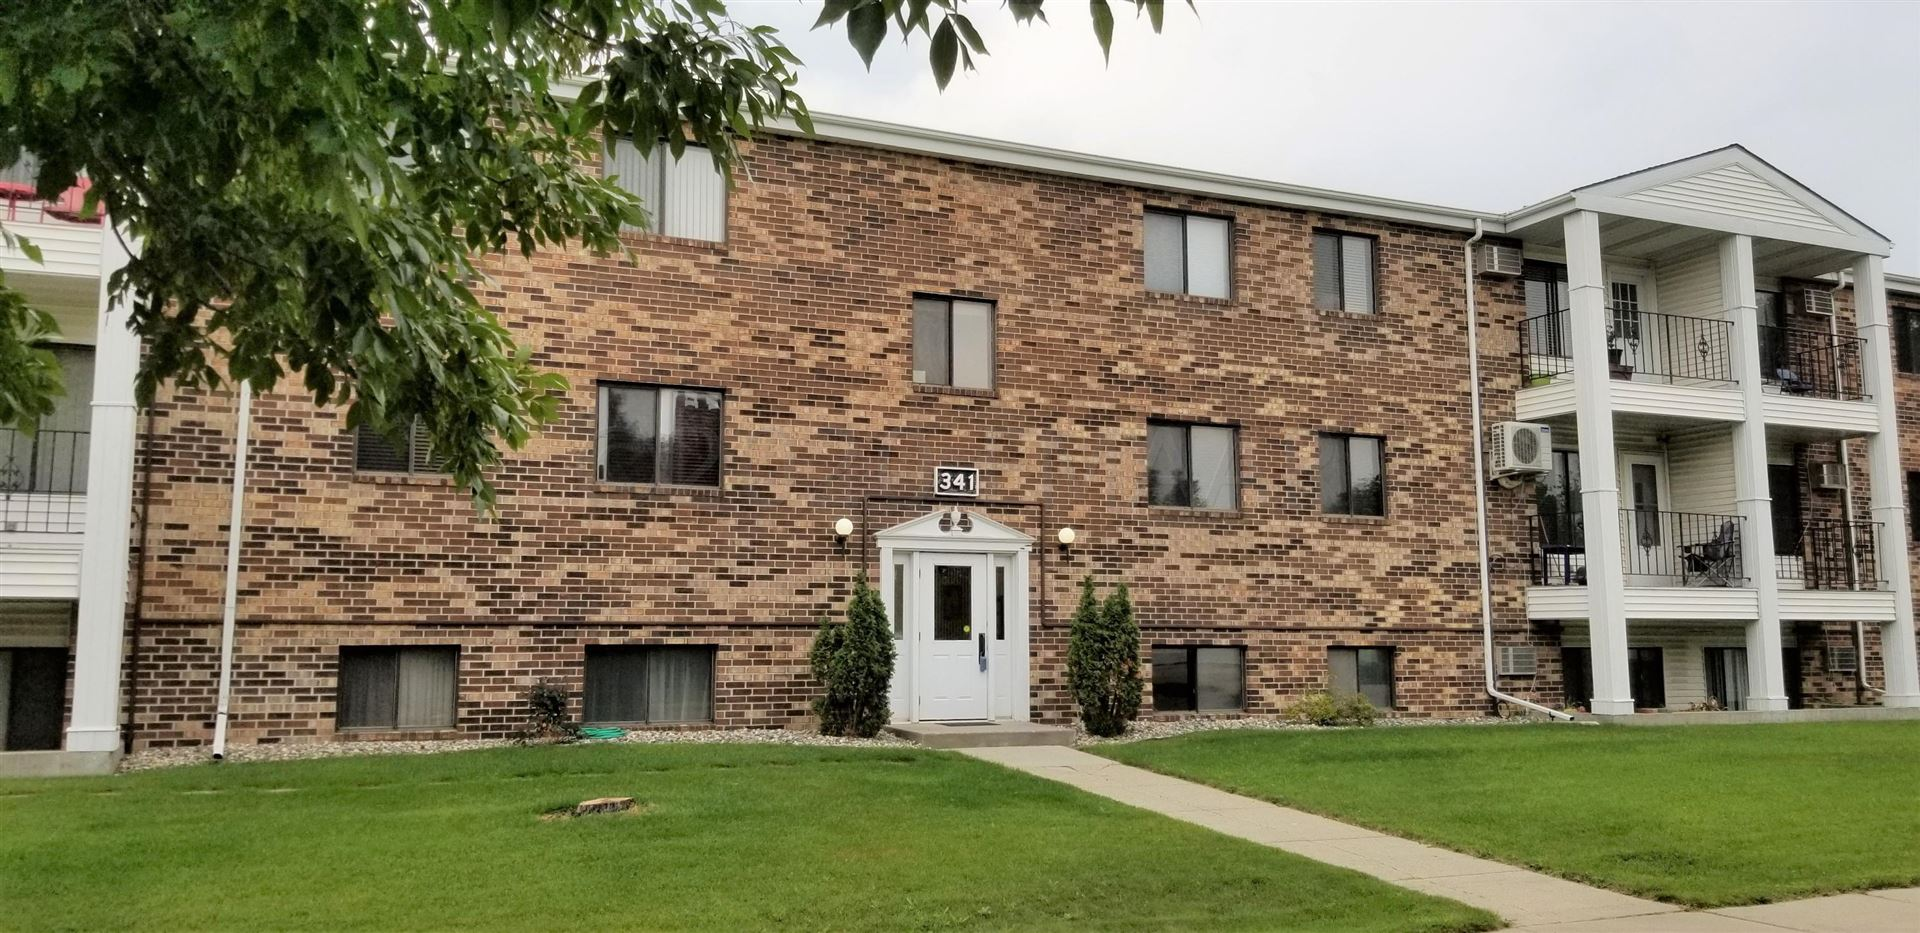 341 PRAIREWOOD S Circle #103, Fargo, ND 58103 - #: 20-4998